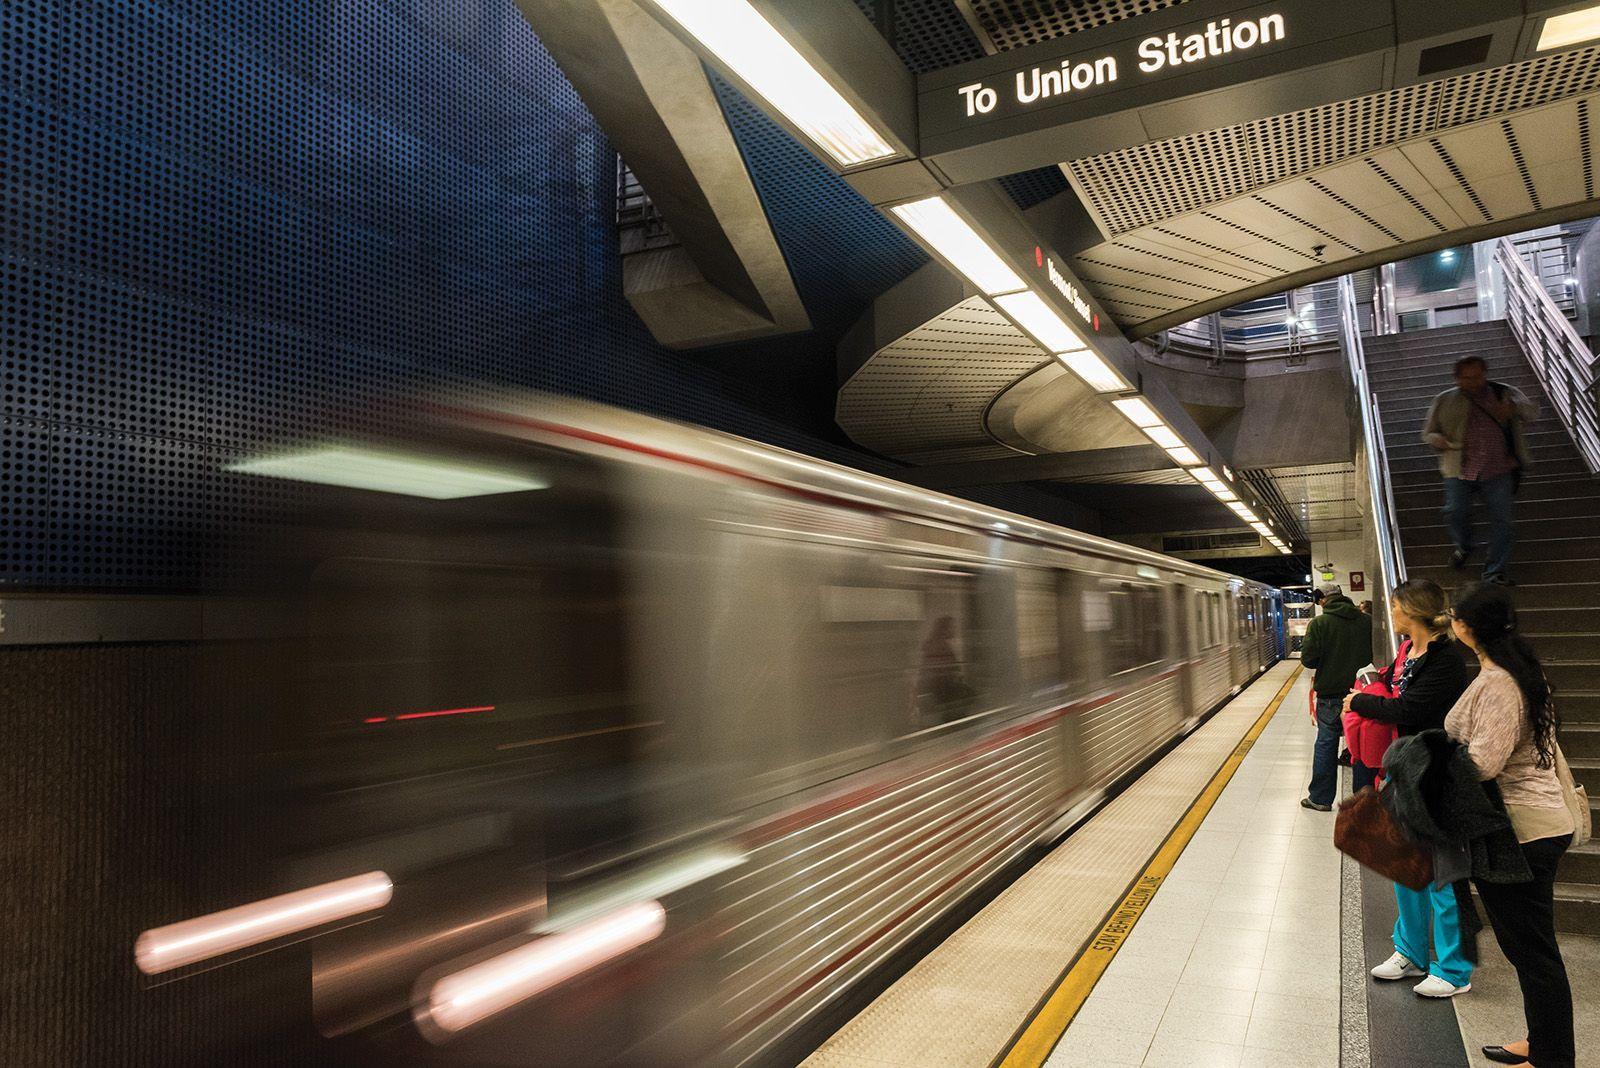 Aaron Julian LA Metro must address safety concerns in